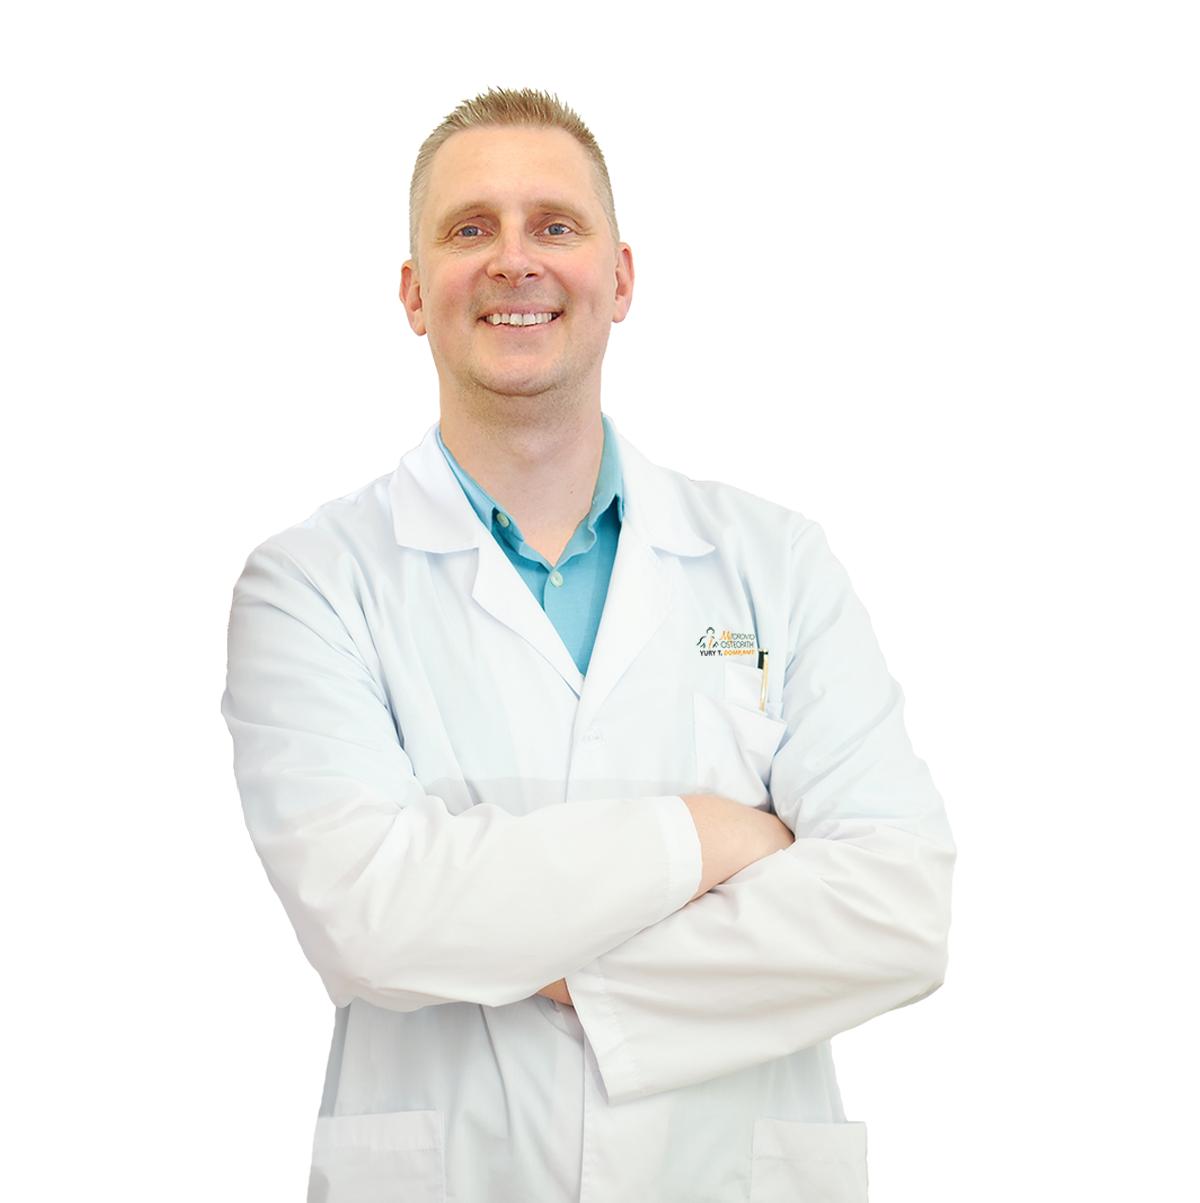 Yury Trybialustau, Osteopath RMT My Toronto Osteopath